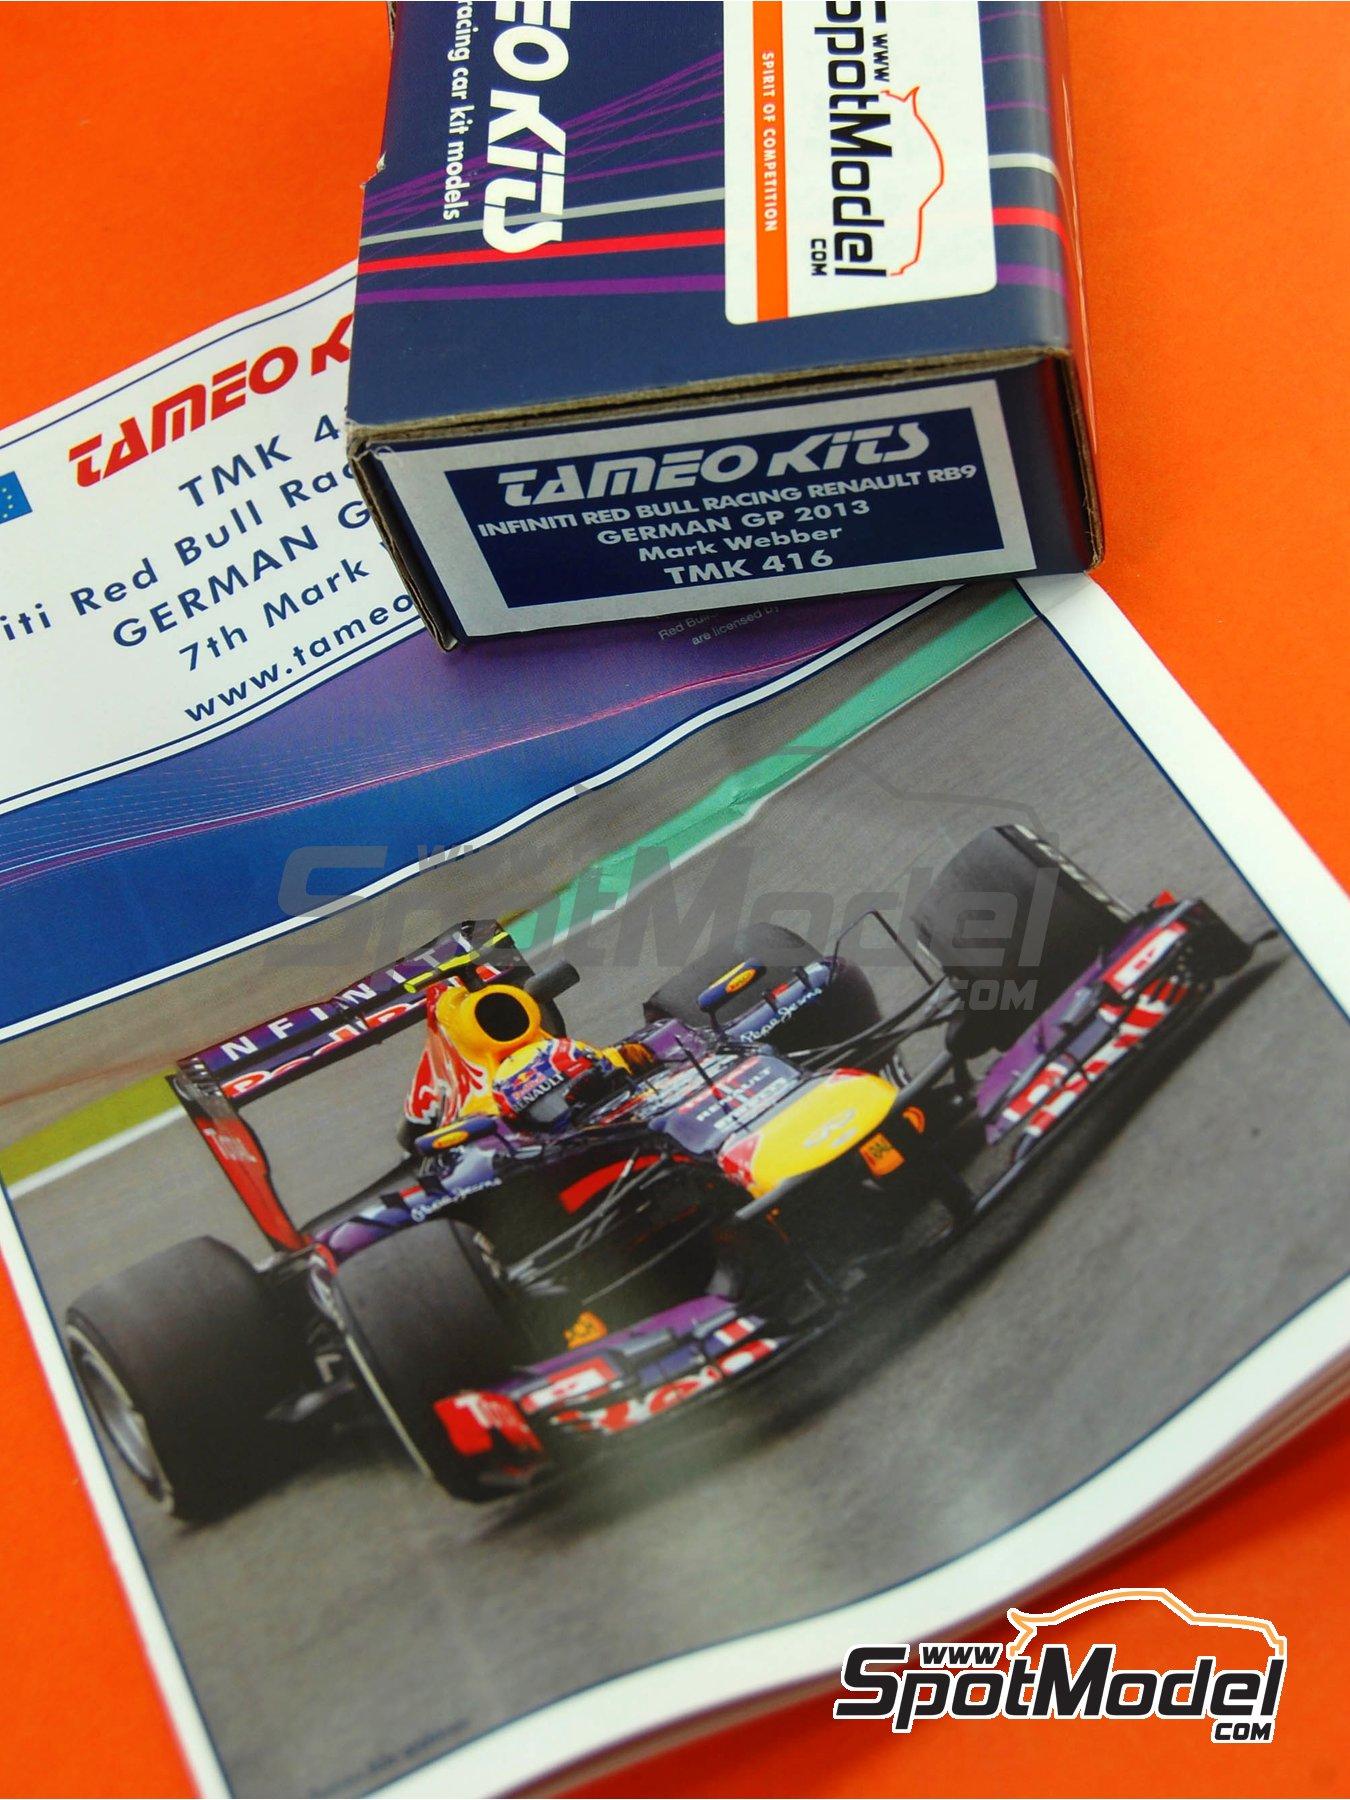 RB Racing Renault RB9 Infiniti - German Formula 1 Grand Prix 2013 | Model car kit in 1/43 scale manufactured by Tameo Kits (ref.TMK416) image